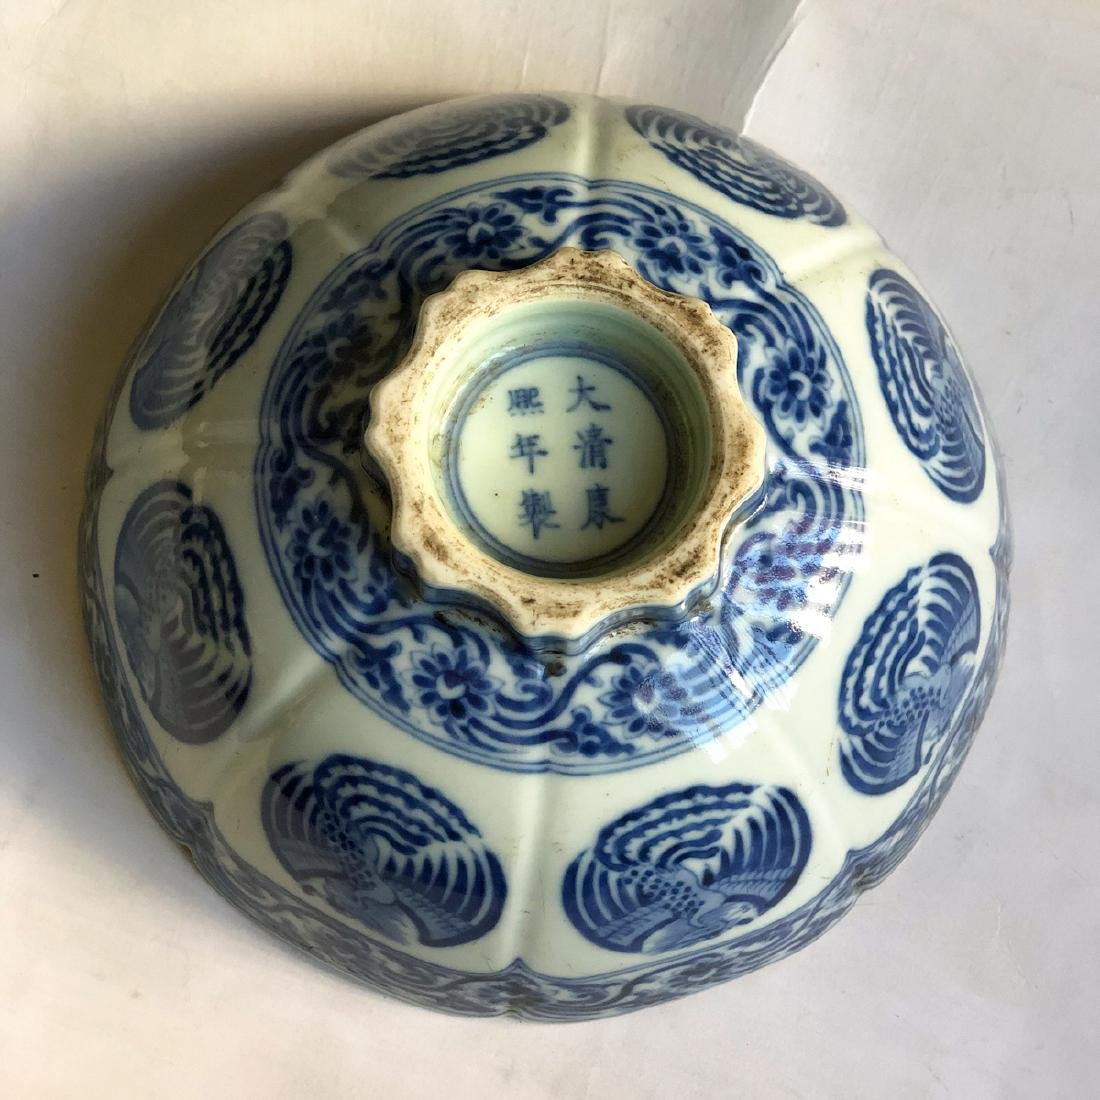 CHINESE BLUE WHITE PORCELAIN BOWL - 7